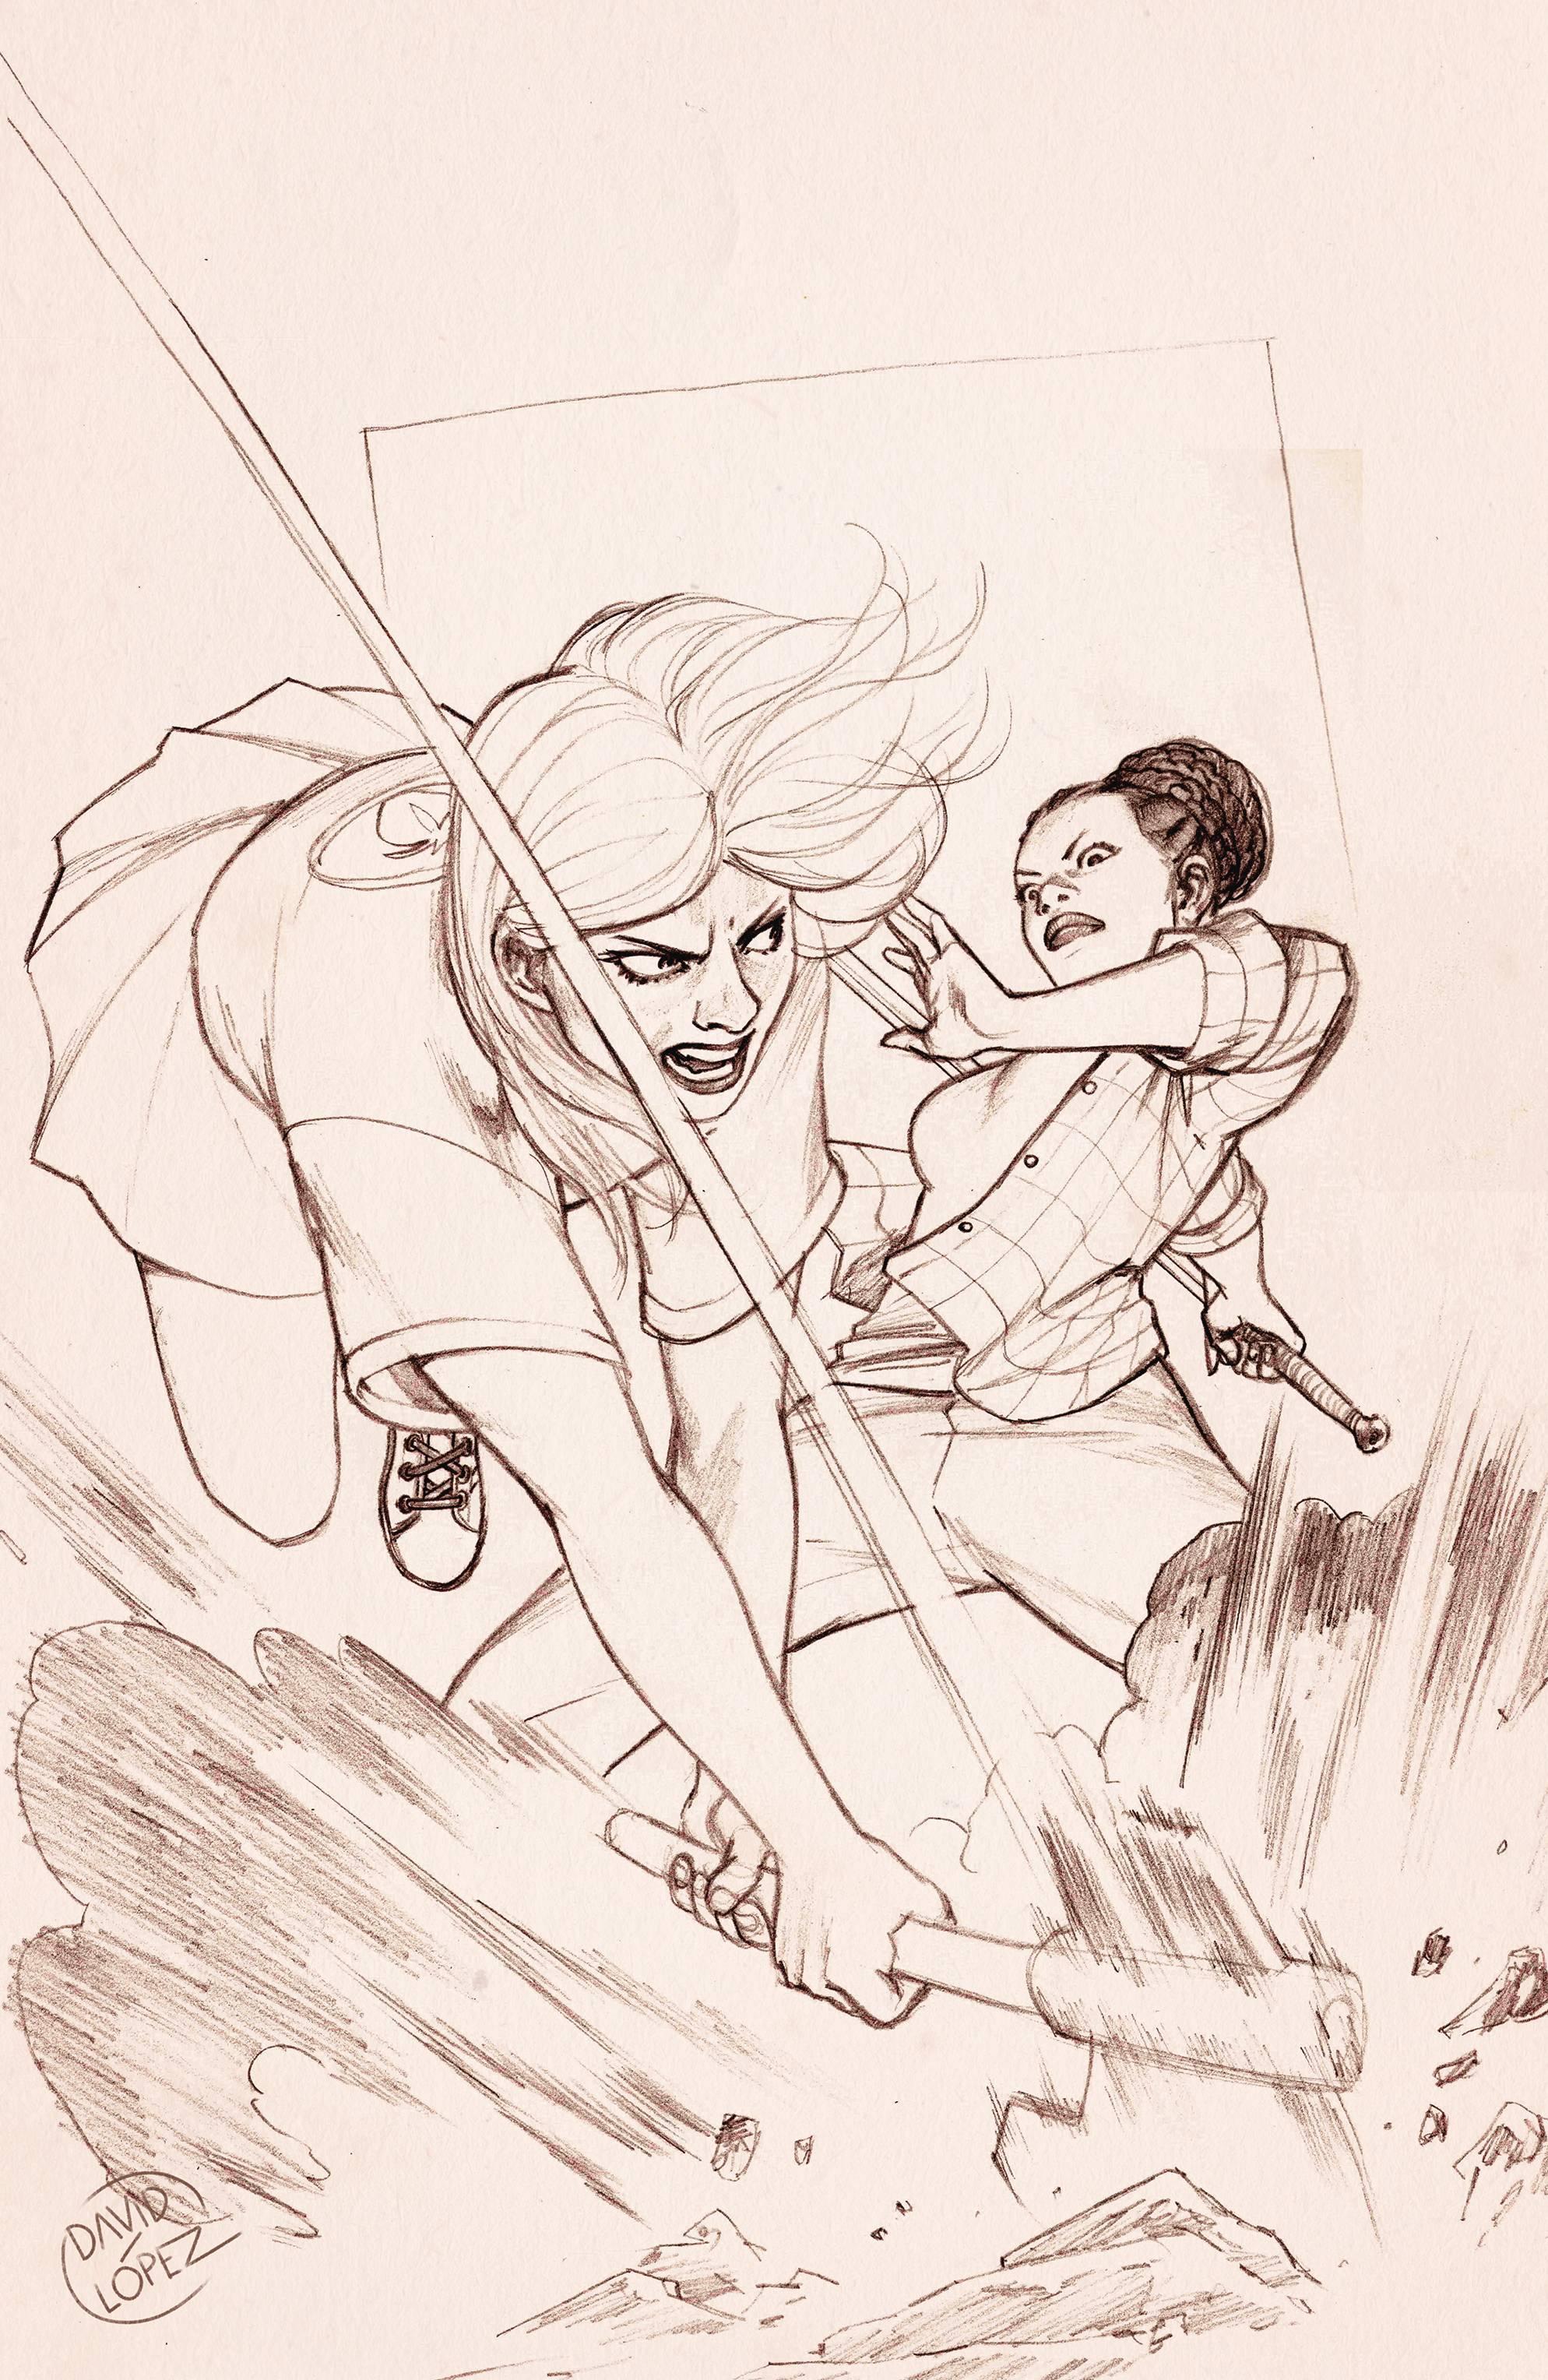 BUFFY THE VAMPIRE SLAYER #18 25 COPY LOPEZ INCV